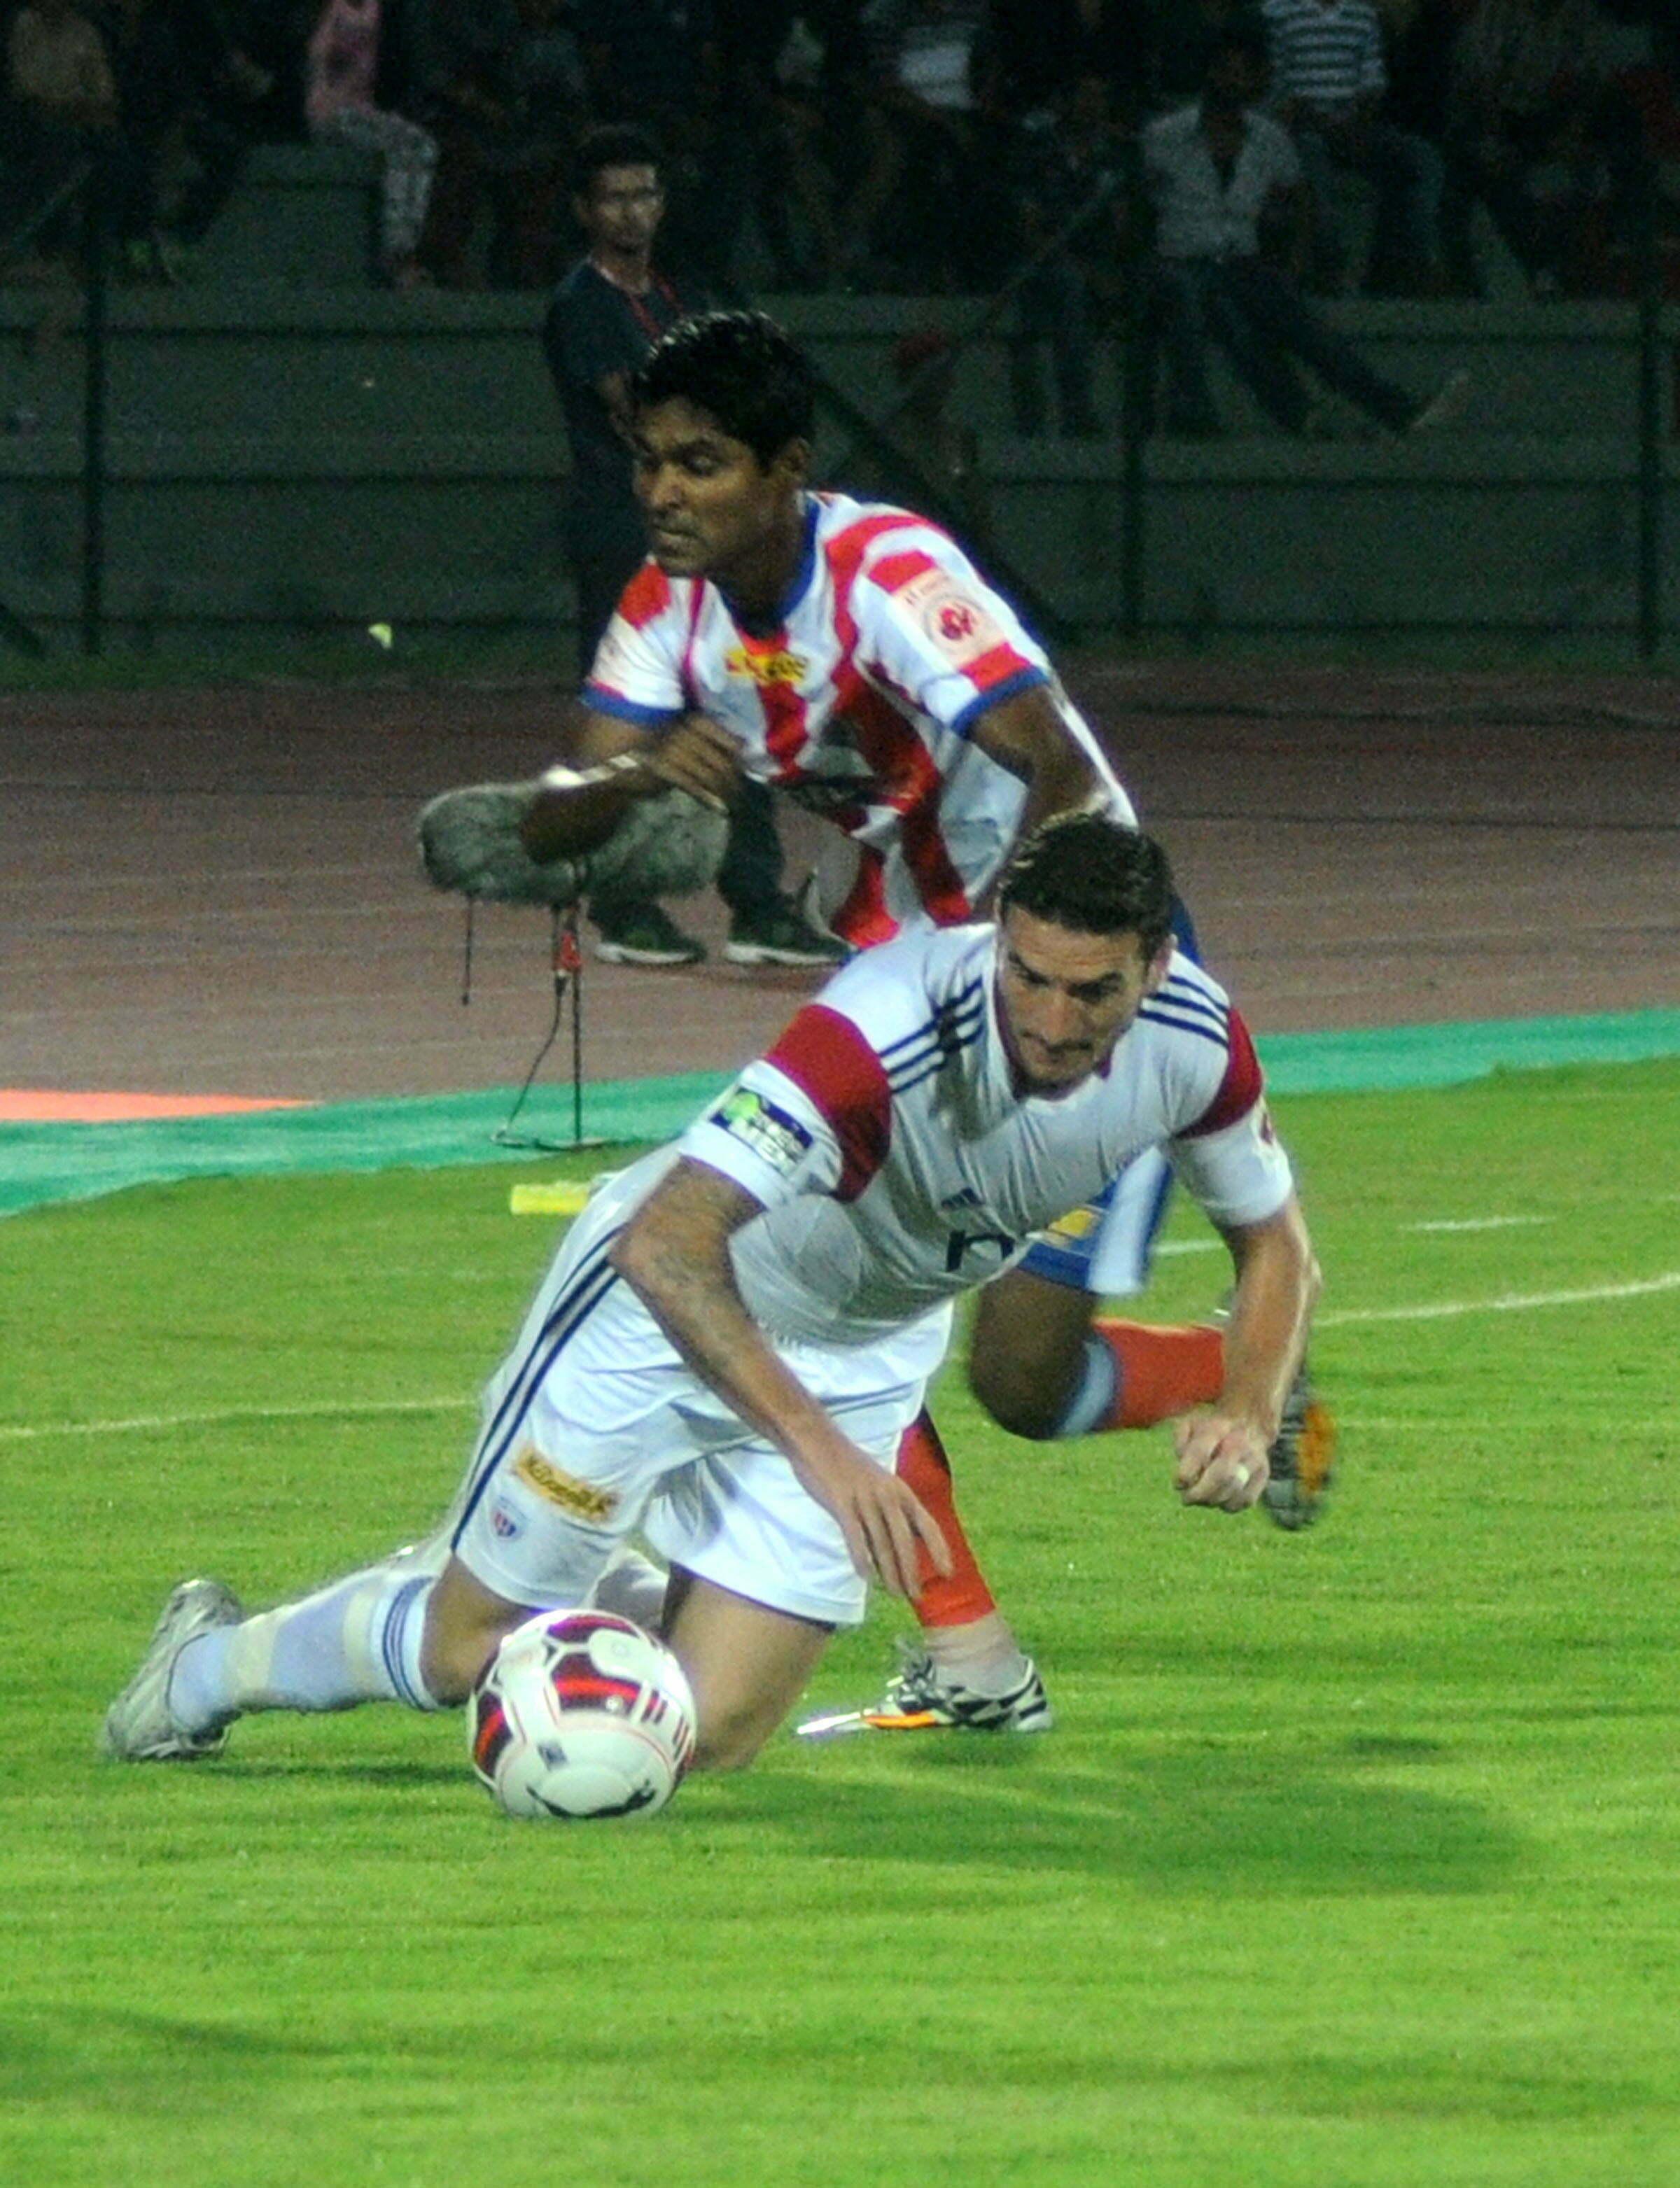 16-10-14 Guwahati- ISL match (6)